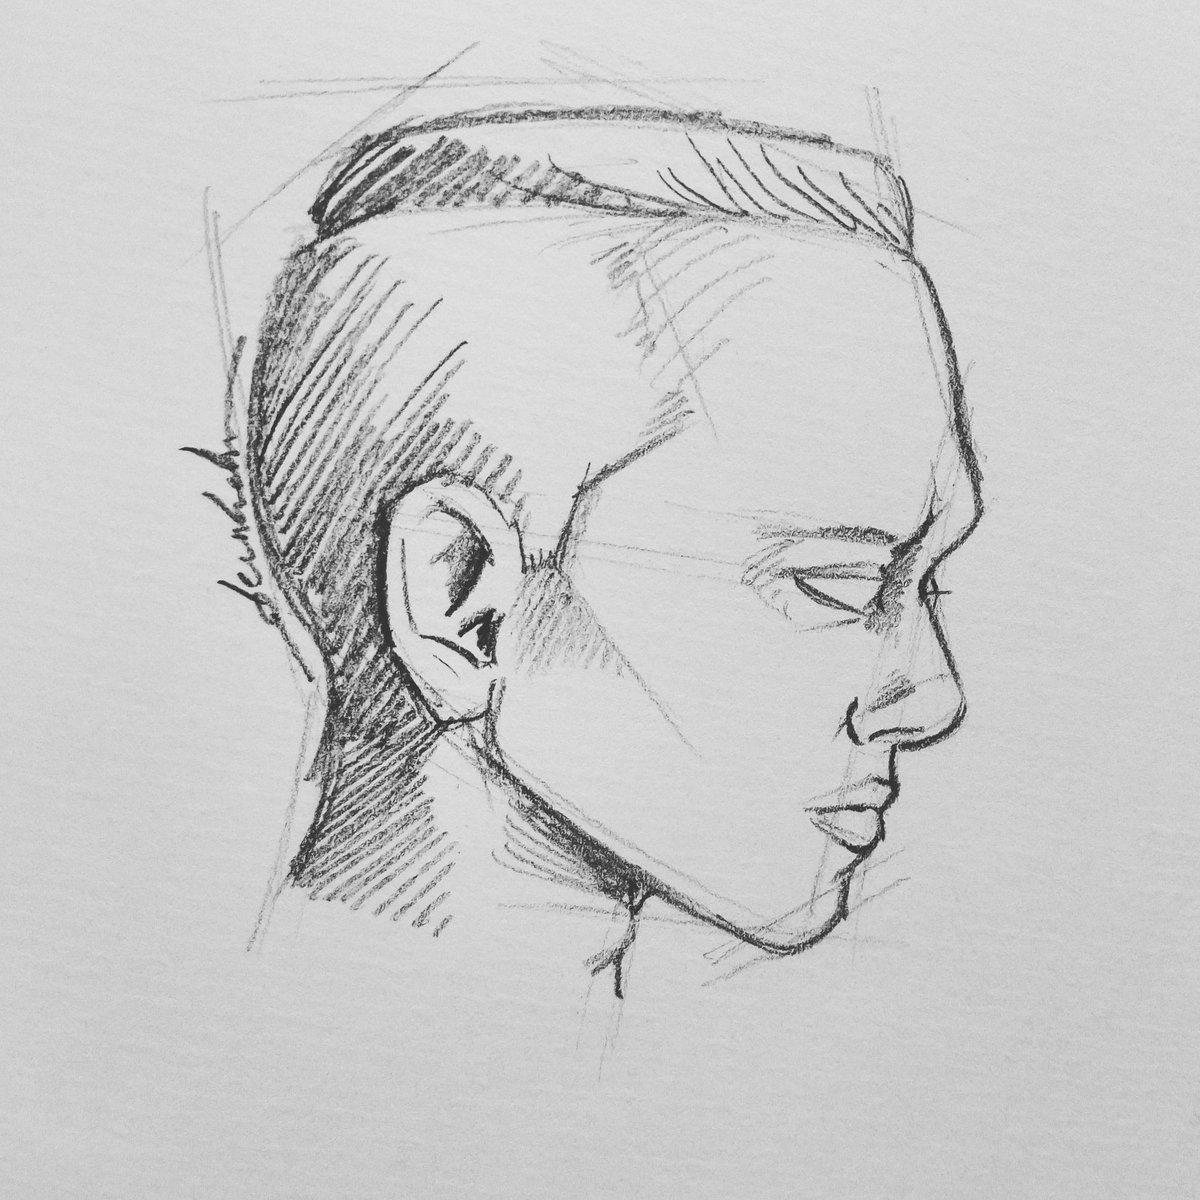 Androgynous #dailyart #dailyillustration #portrait #face #pencil #androgyne #androgynous https://t.co/4M2j2xM5td